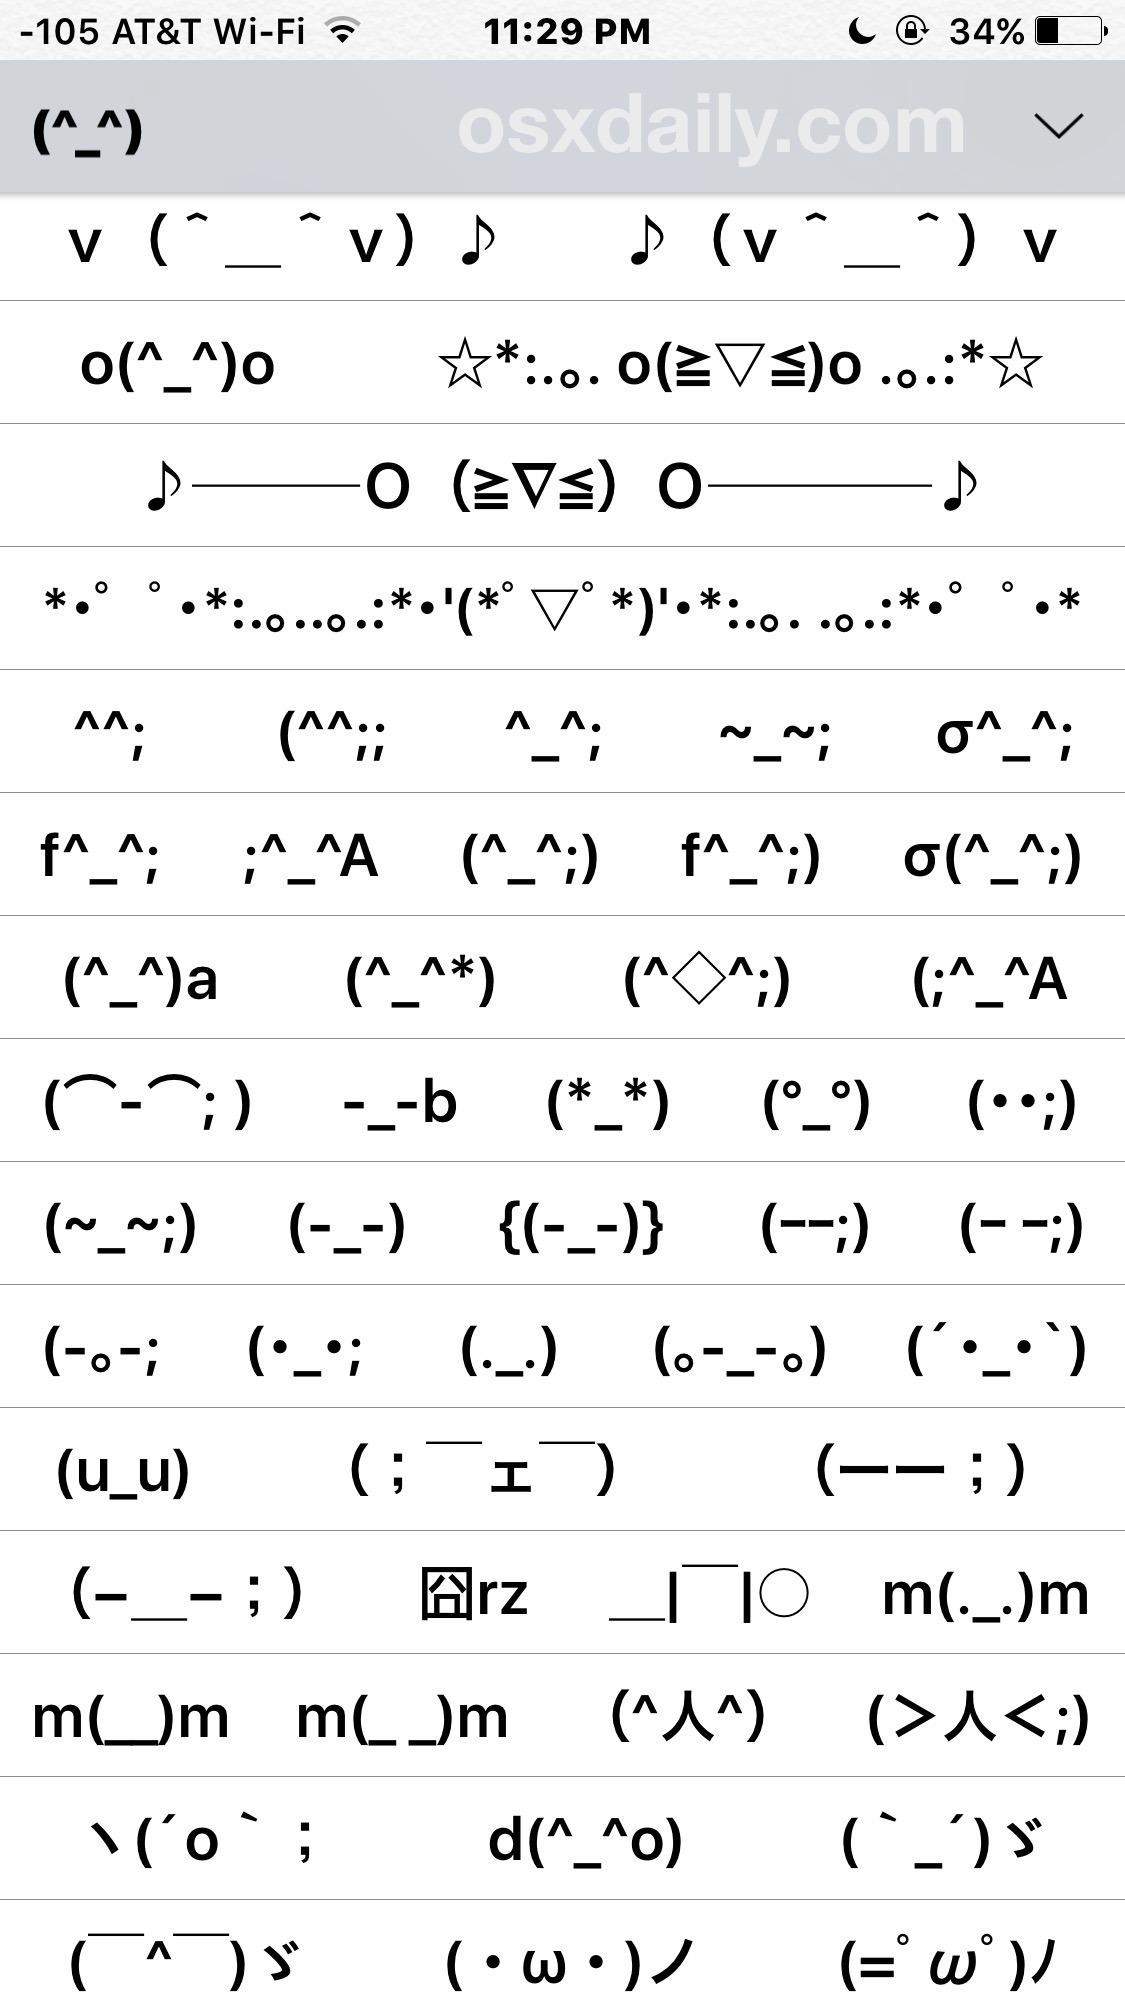 Emoticon keyboard su iPhone